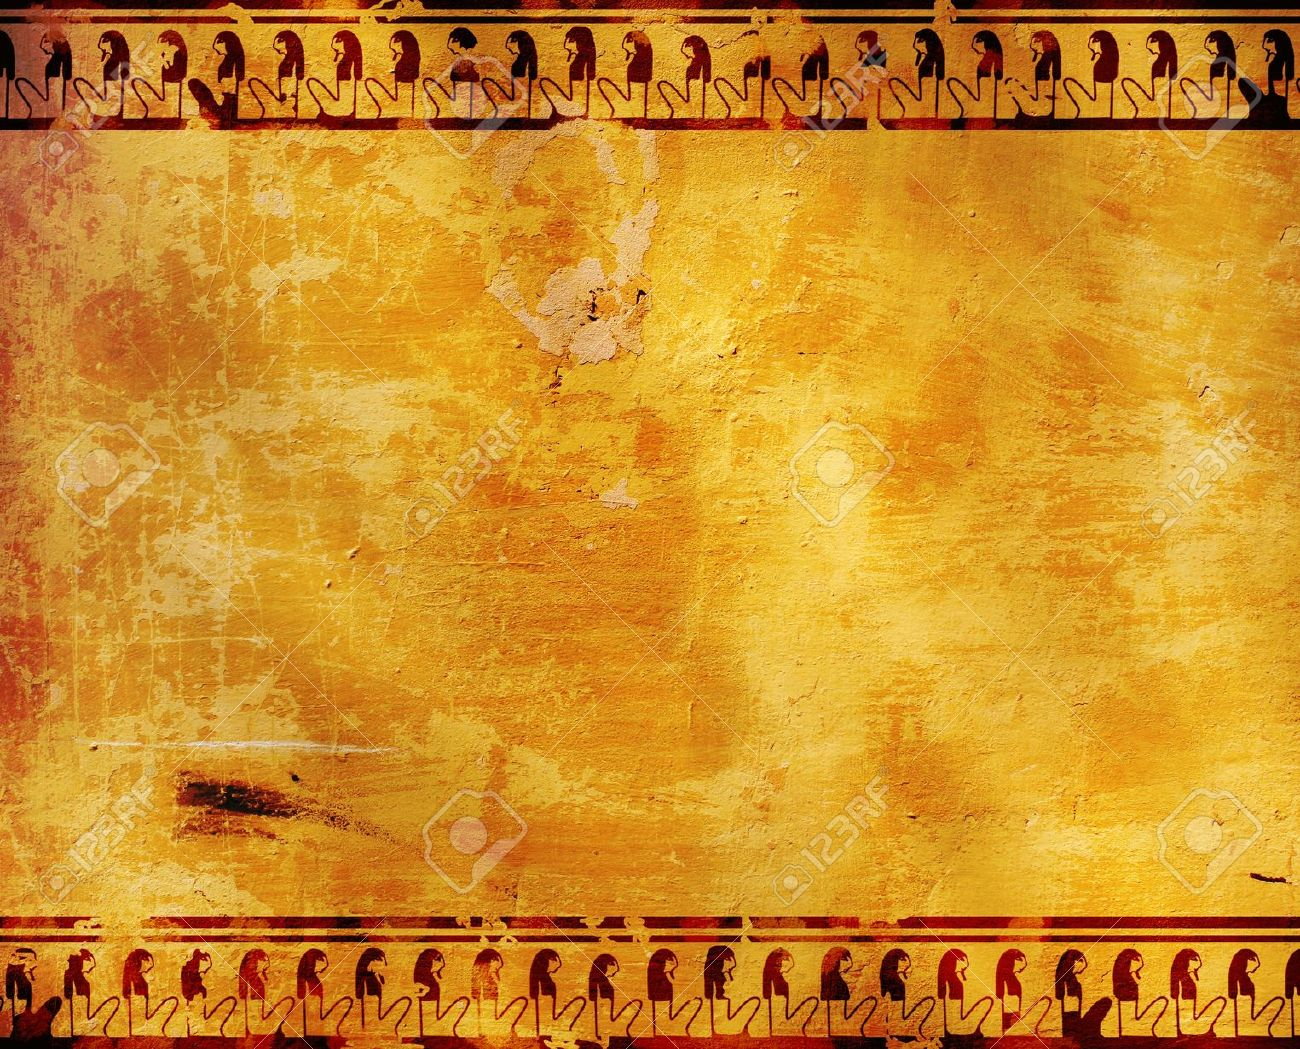 Background with egyptian symbols stucco texture stock photo background with egyptian symbols stucco texture stock photo 9098710 buycottarizona Image collections